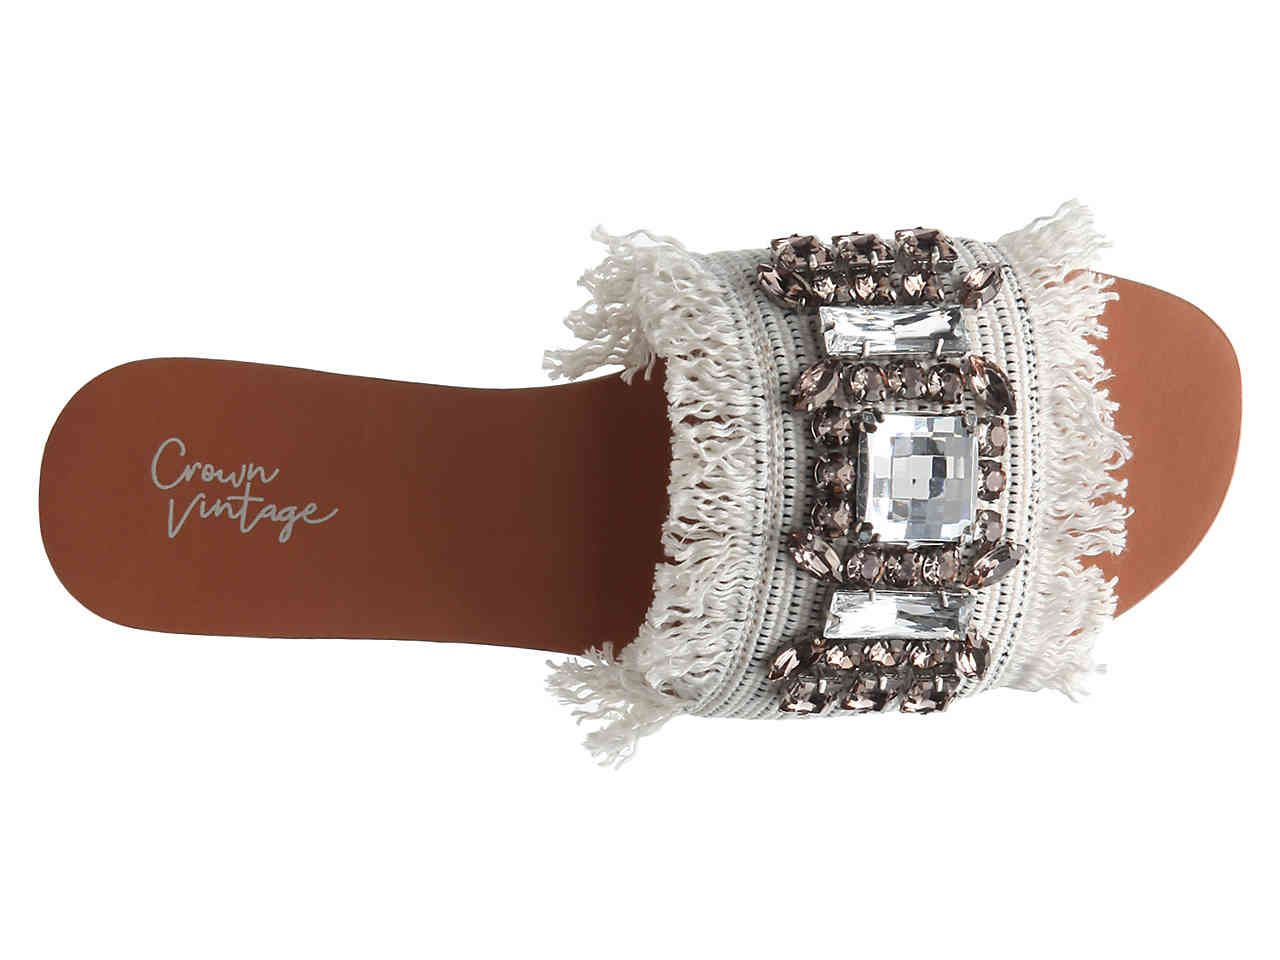 db26246f10fd Crown Vintage Glorianna Slide Sandal Women s Shoes